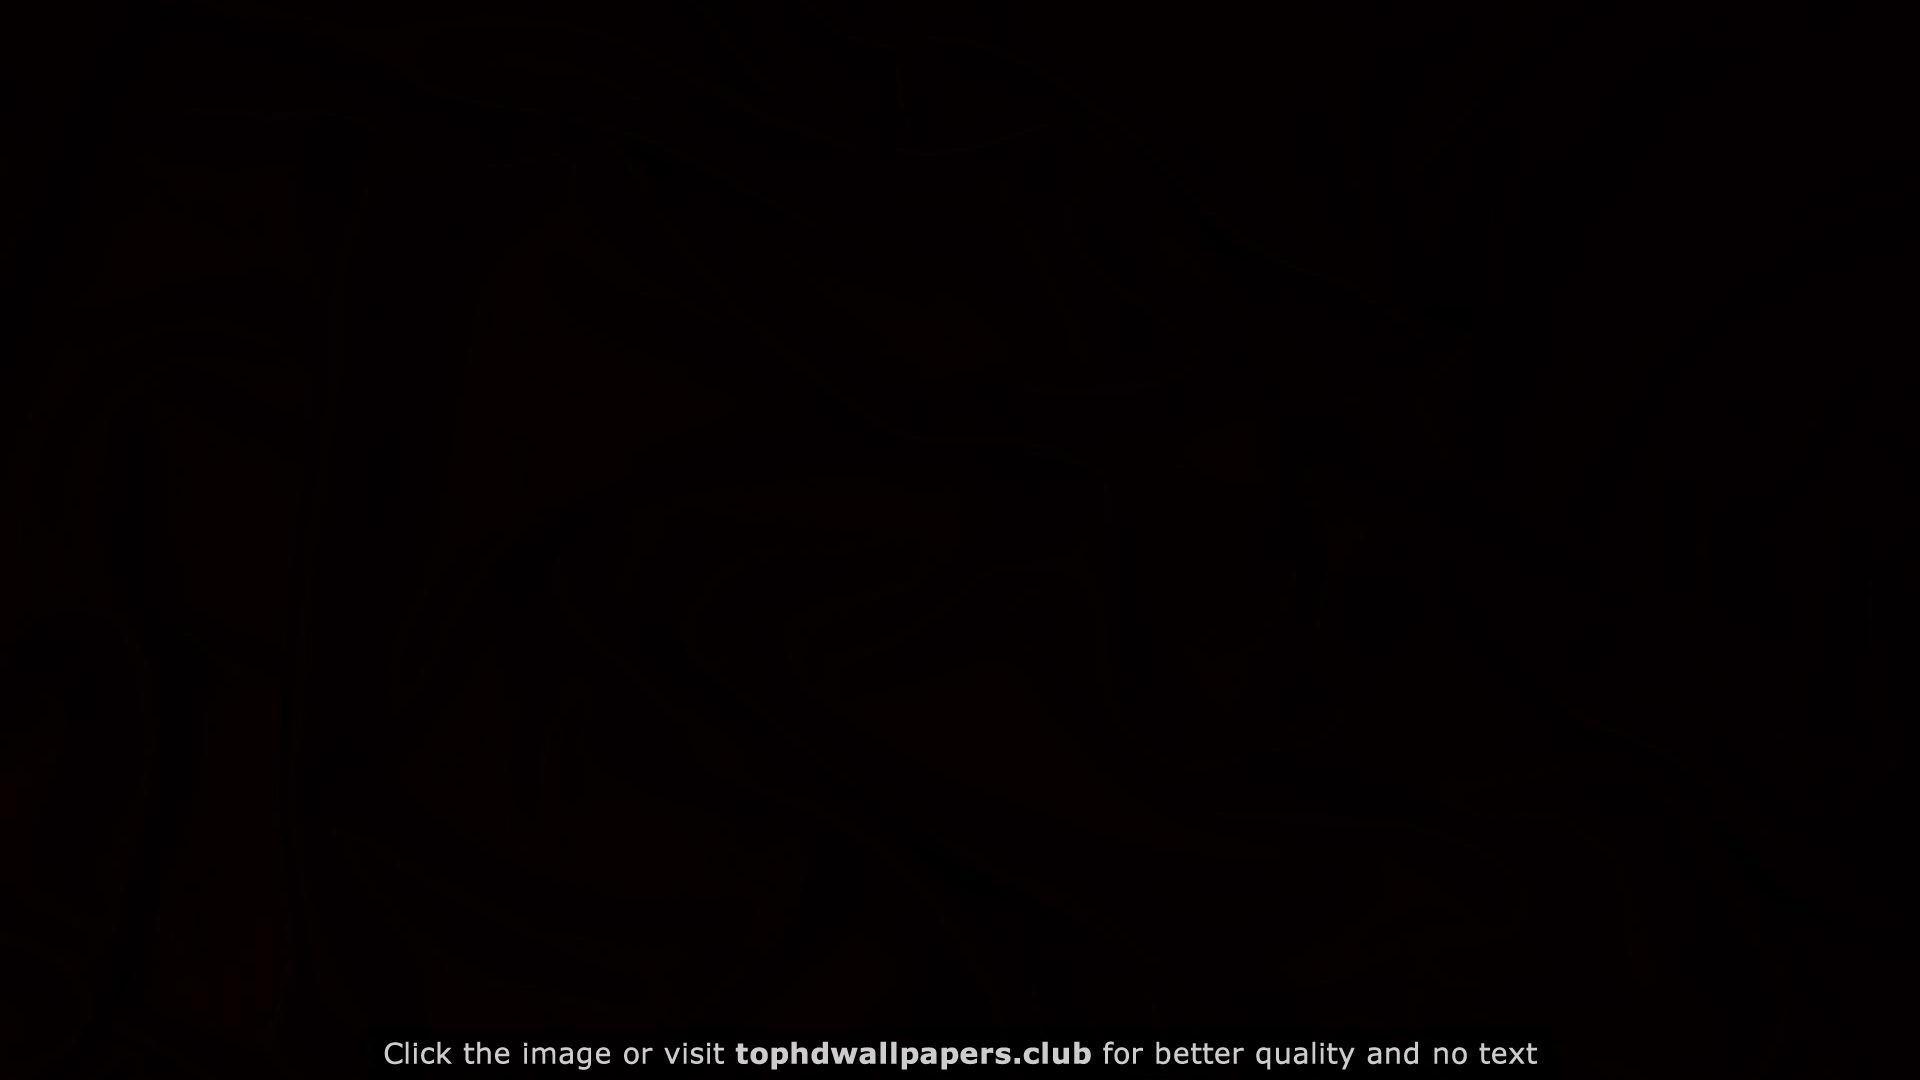 4k Dark Wallpaper 48 Images